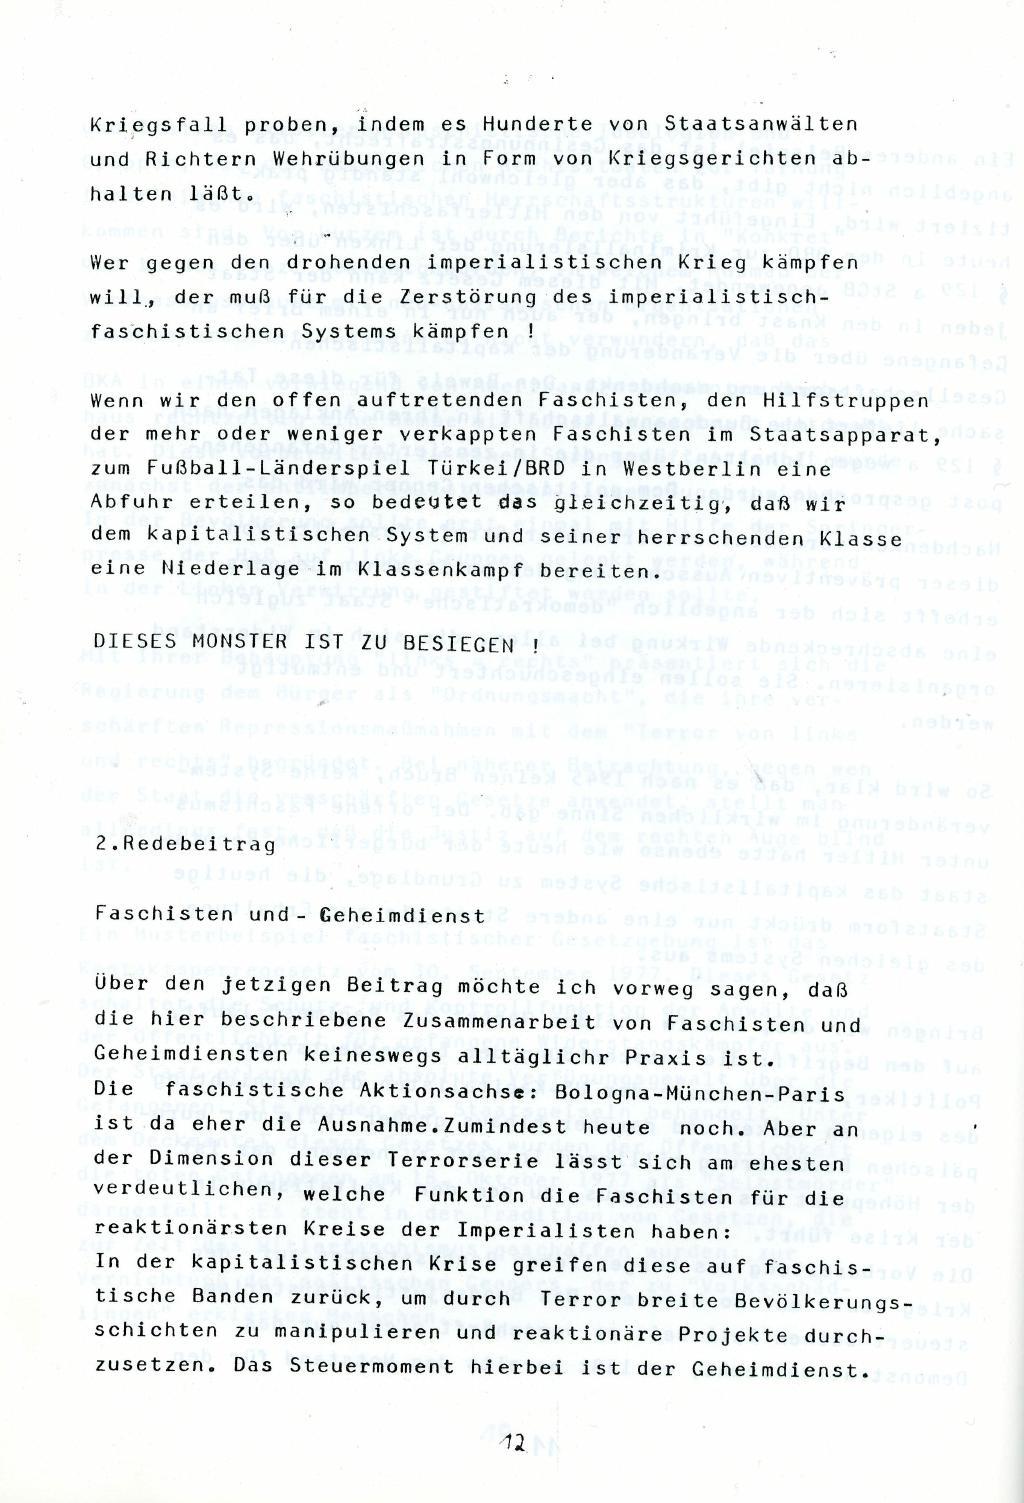 Berlin_1983_Autonome_Gruppen_Faschismus_im_Kapitalismus_12